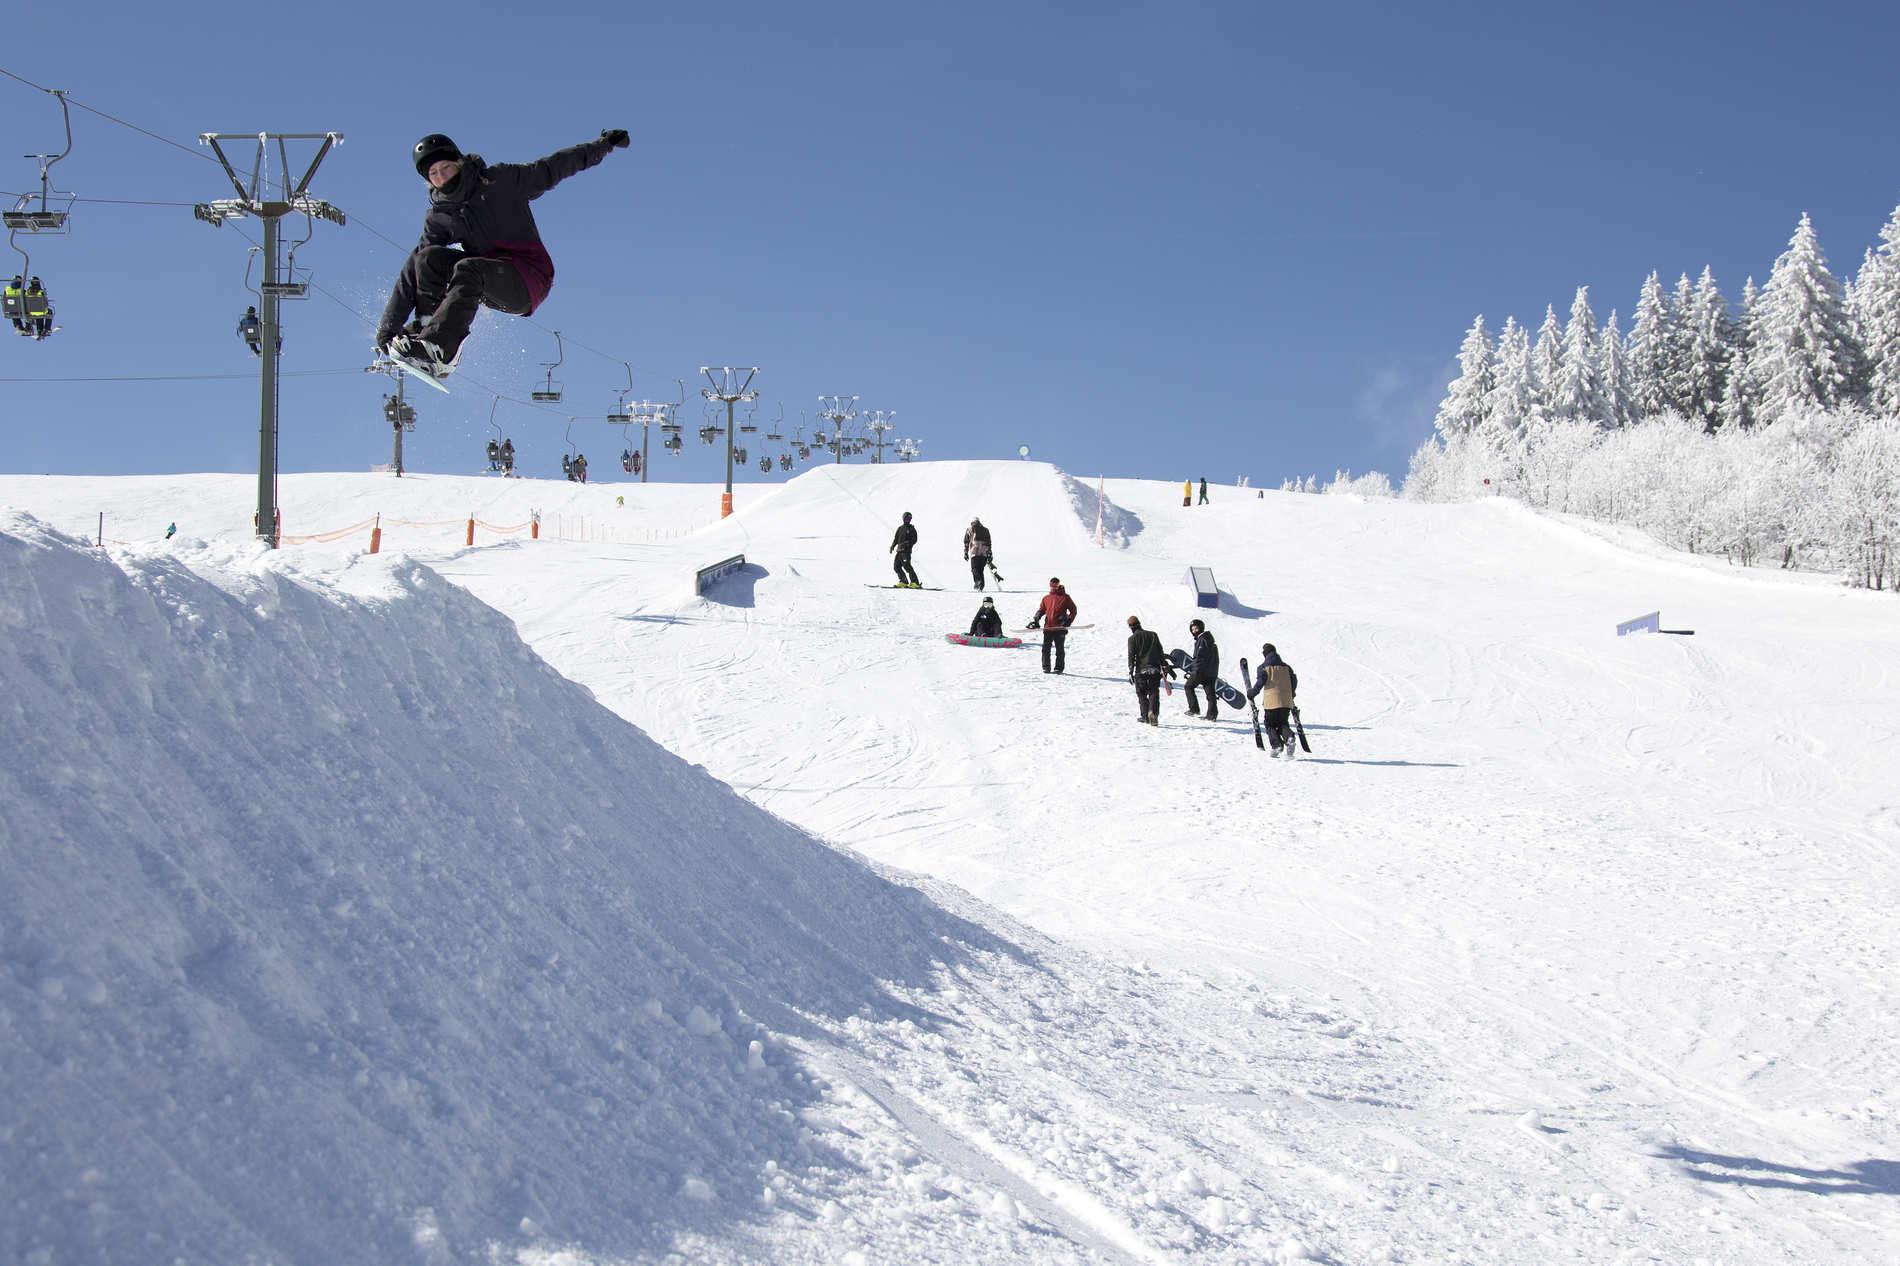 snowpark feldberg 24 02 2018 action sb annika bartmann martin herrmann qparks 45